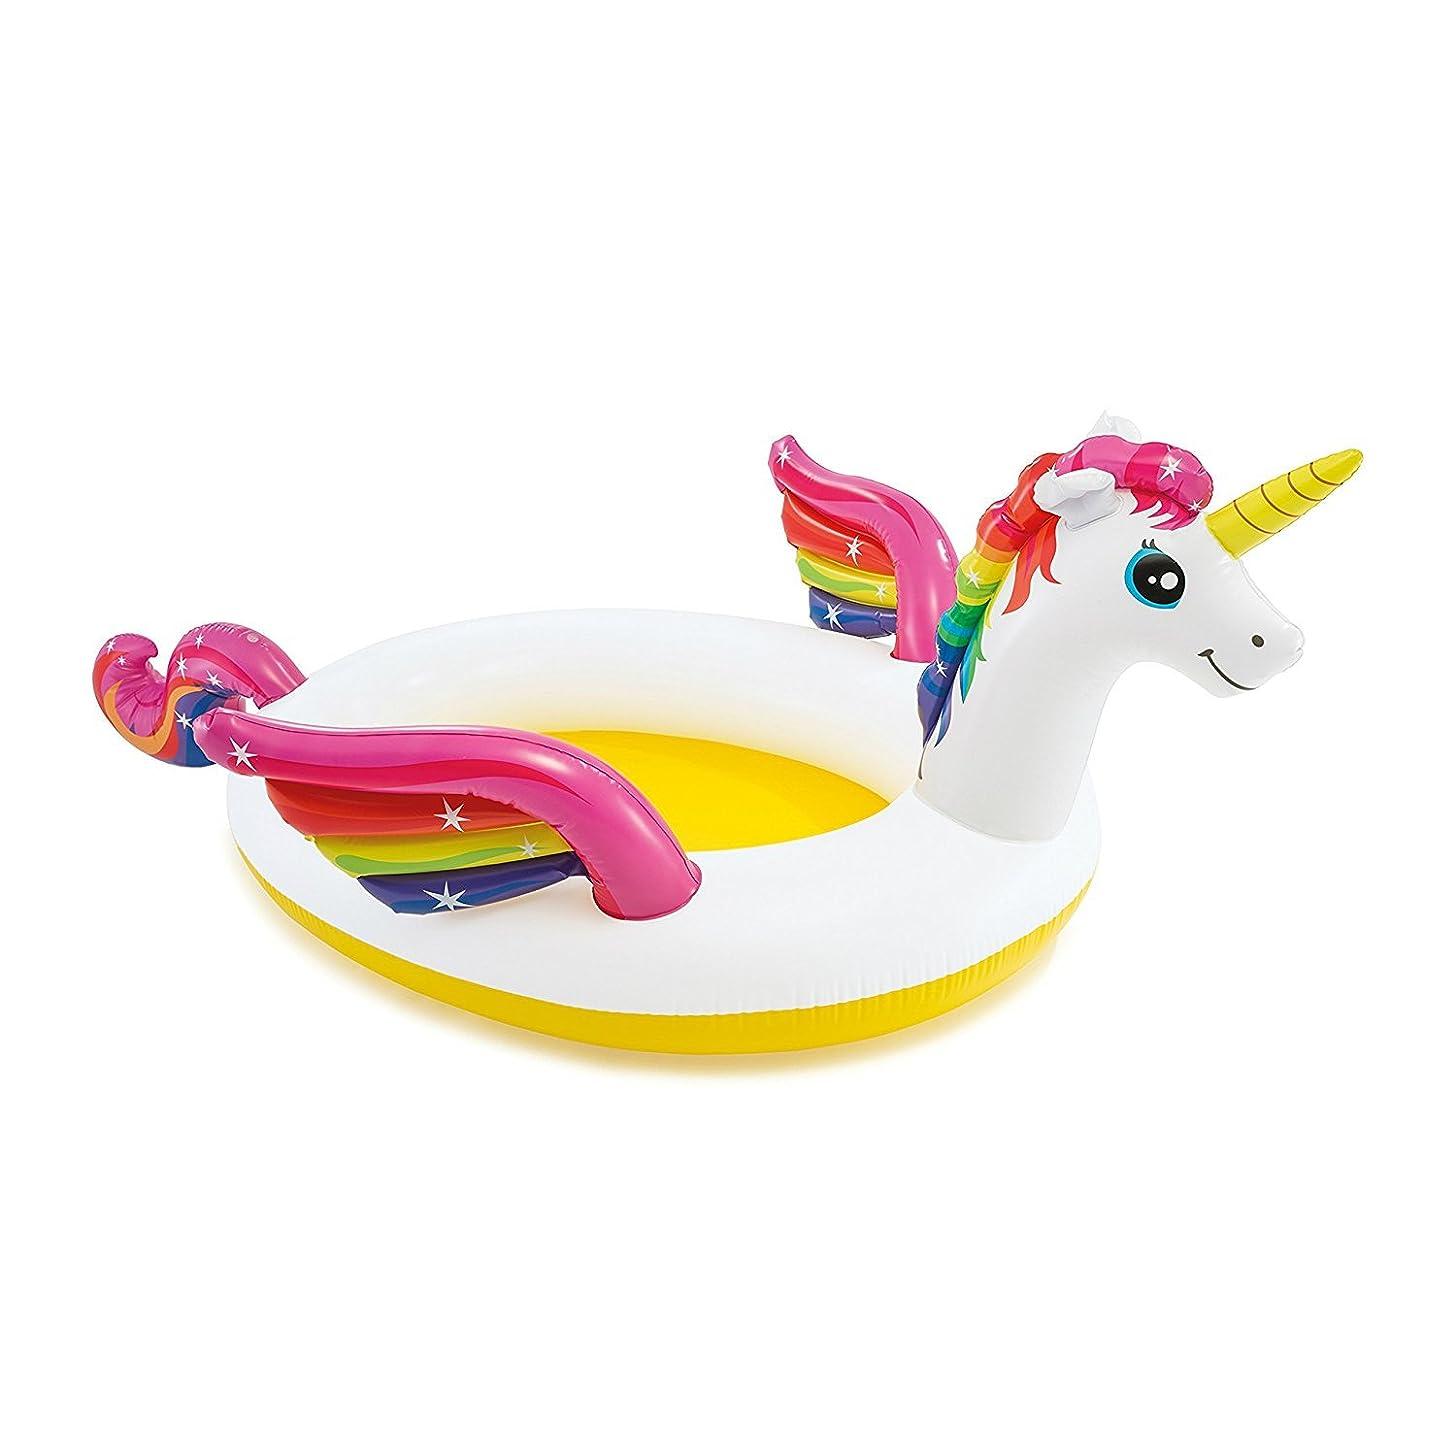 JGT Mystic Unicorn Inflatable Spray Pool, 107